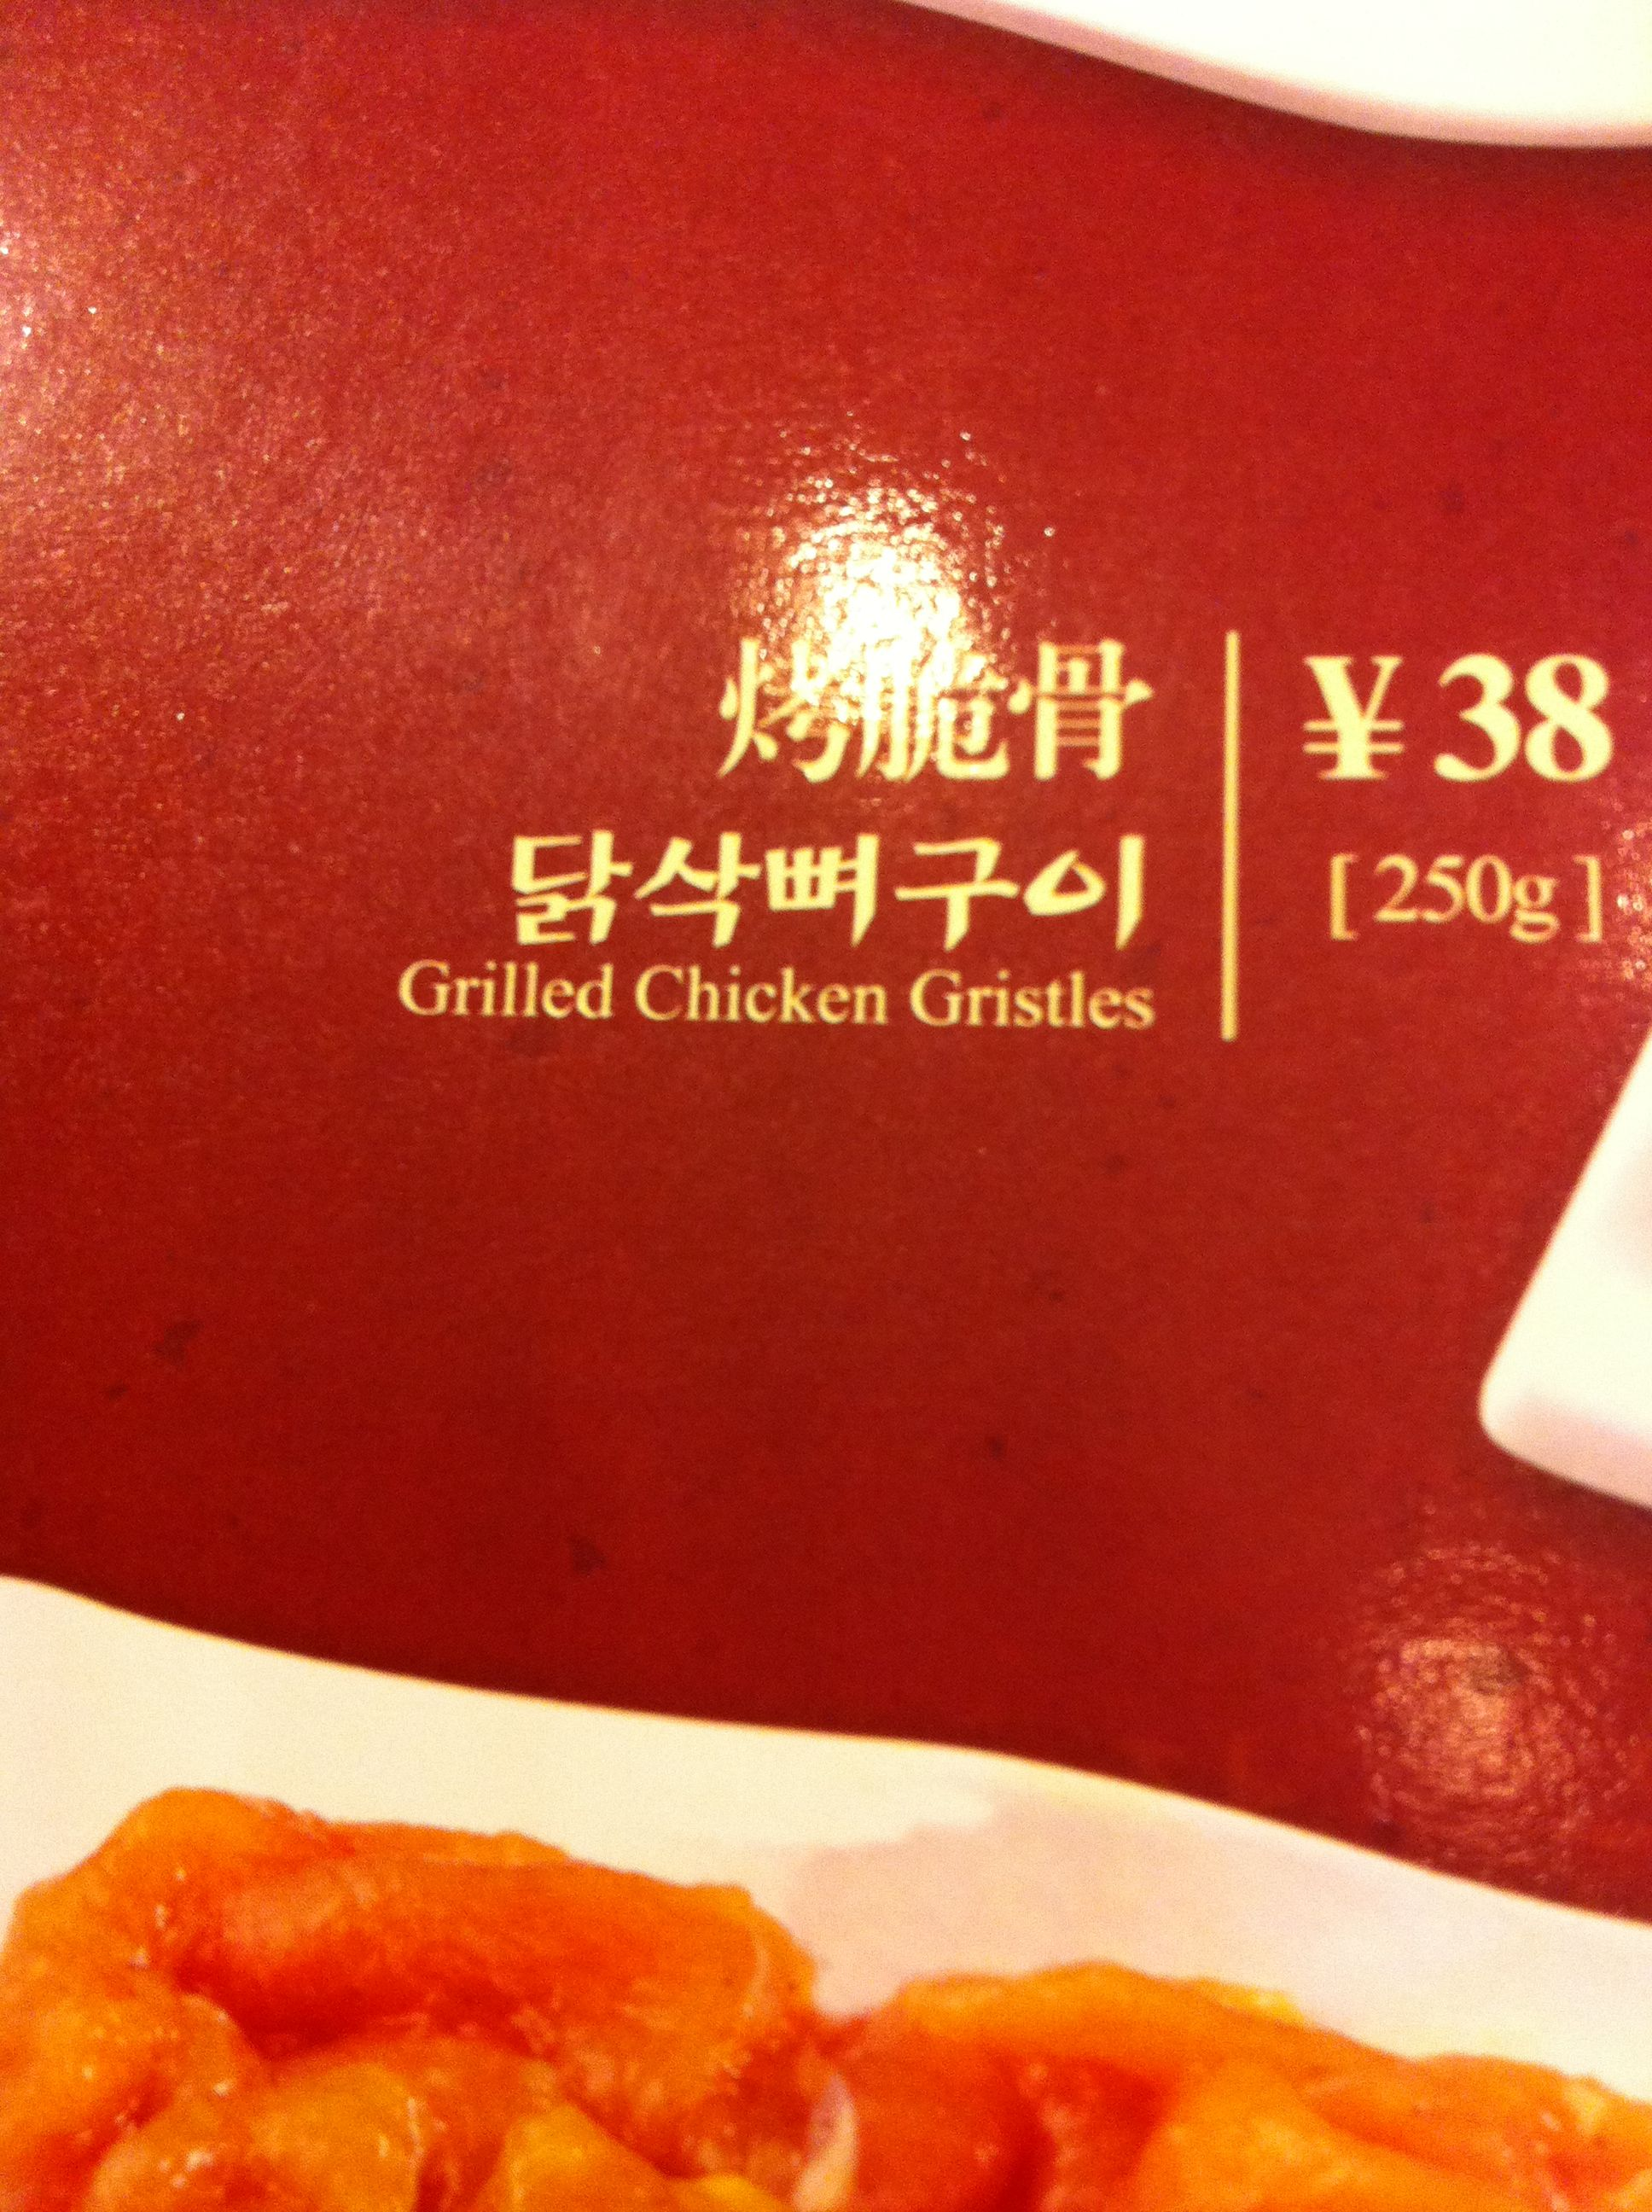 Yum - food? really?